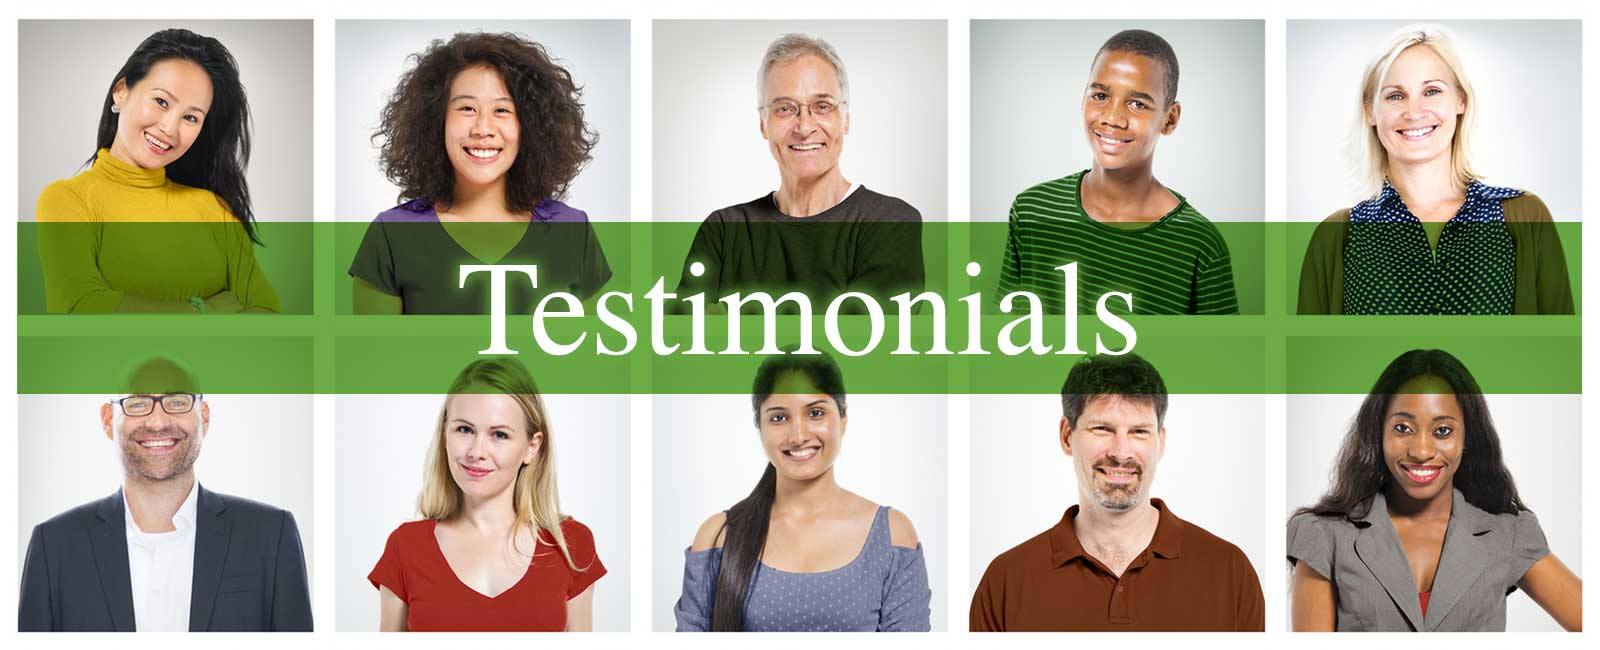 Owner Testimonials 44fe41be5c598682f48b673ed52bf4d3